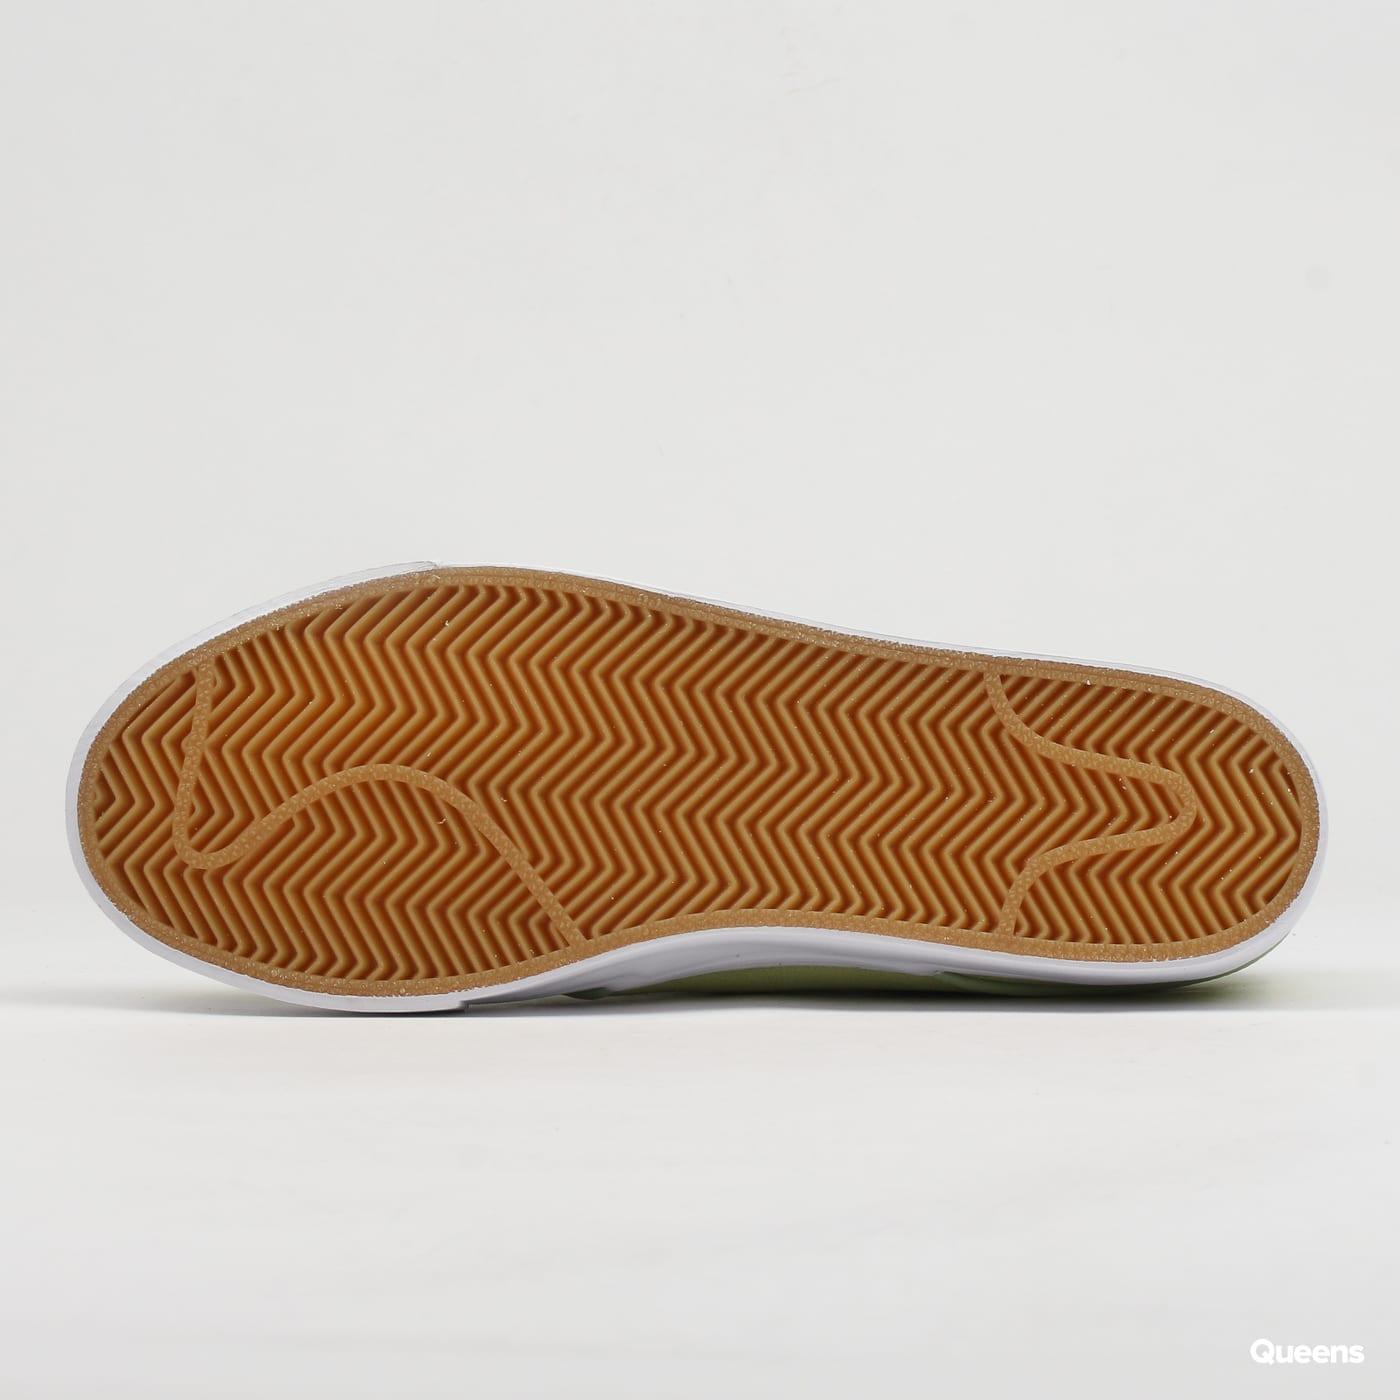 Nike Zoom Stefan Janoski barely volt / barely volt - white